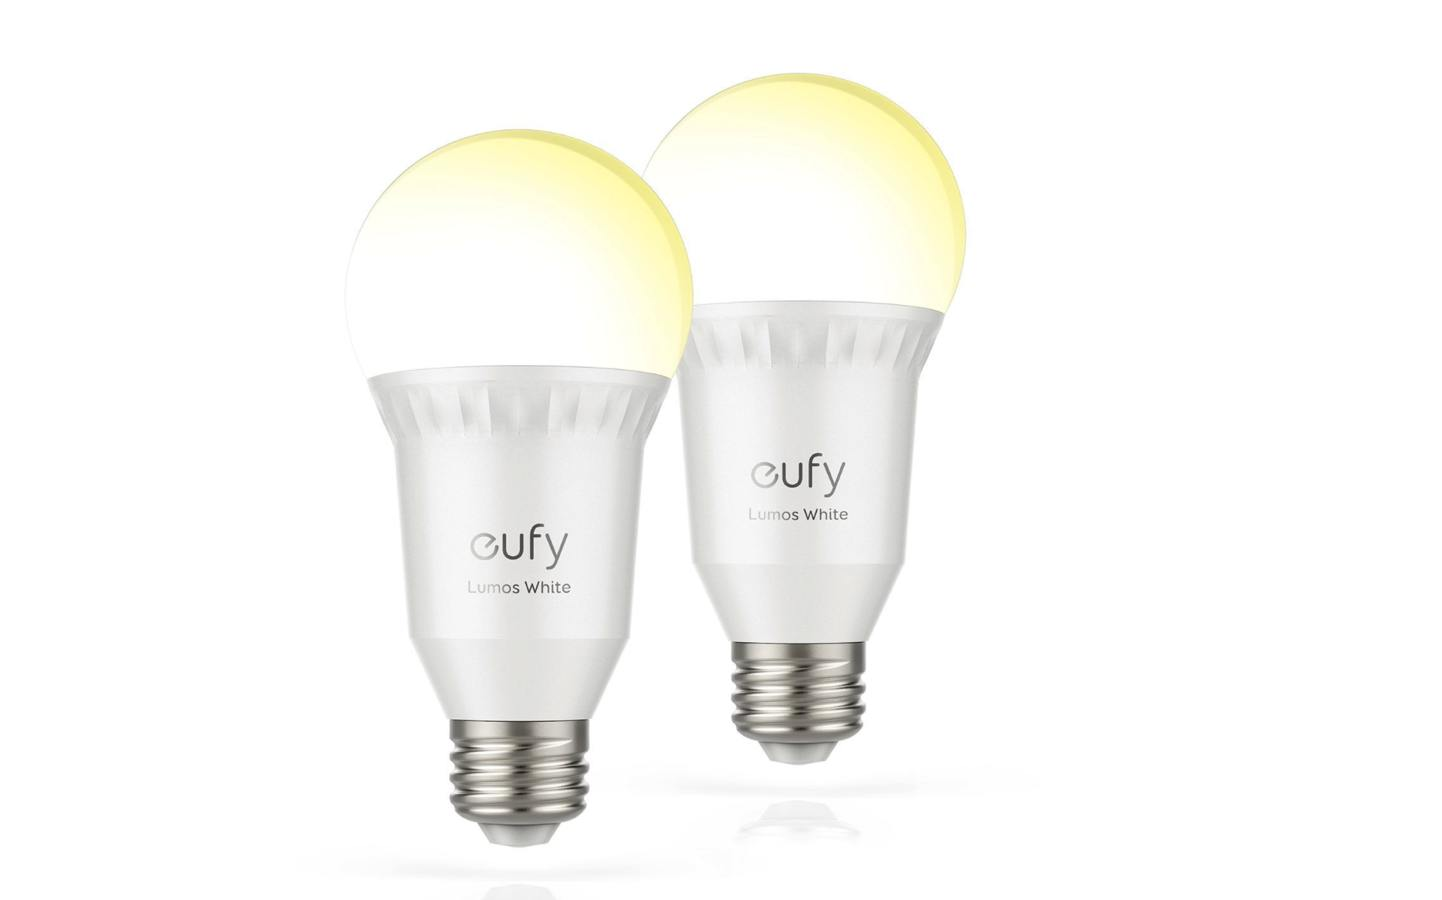 anker eufy smart bulbs